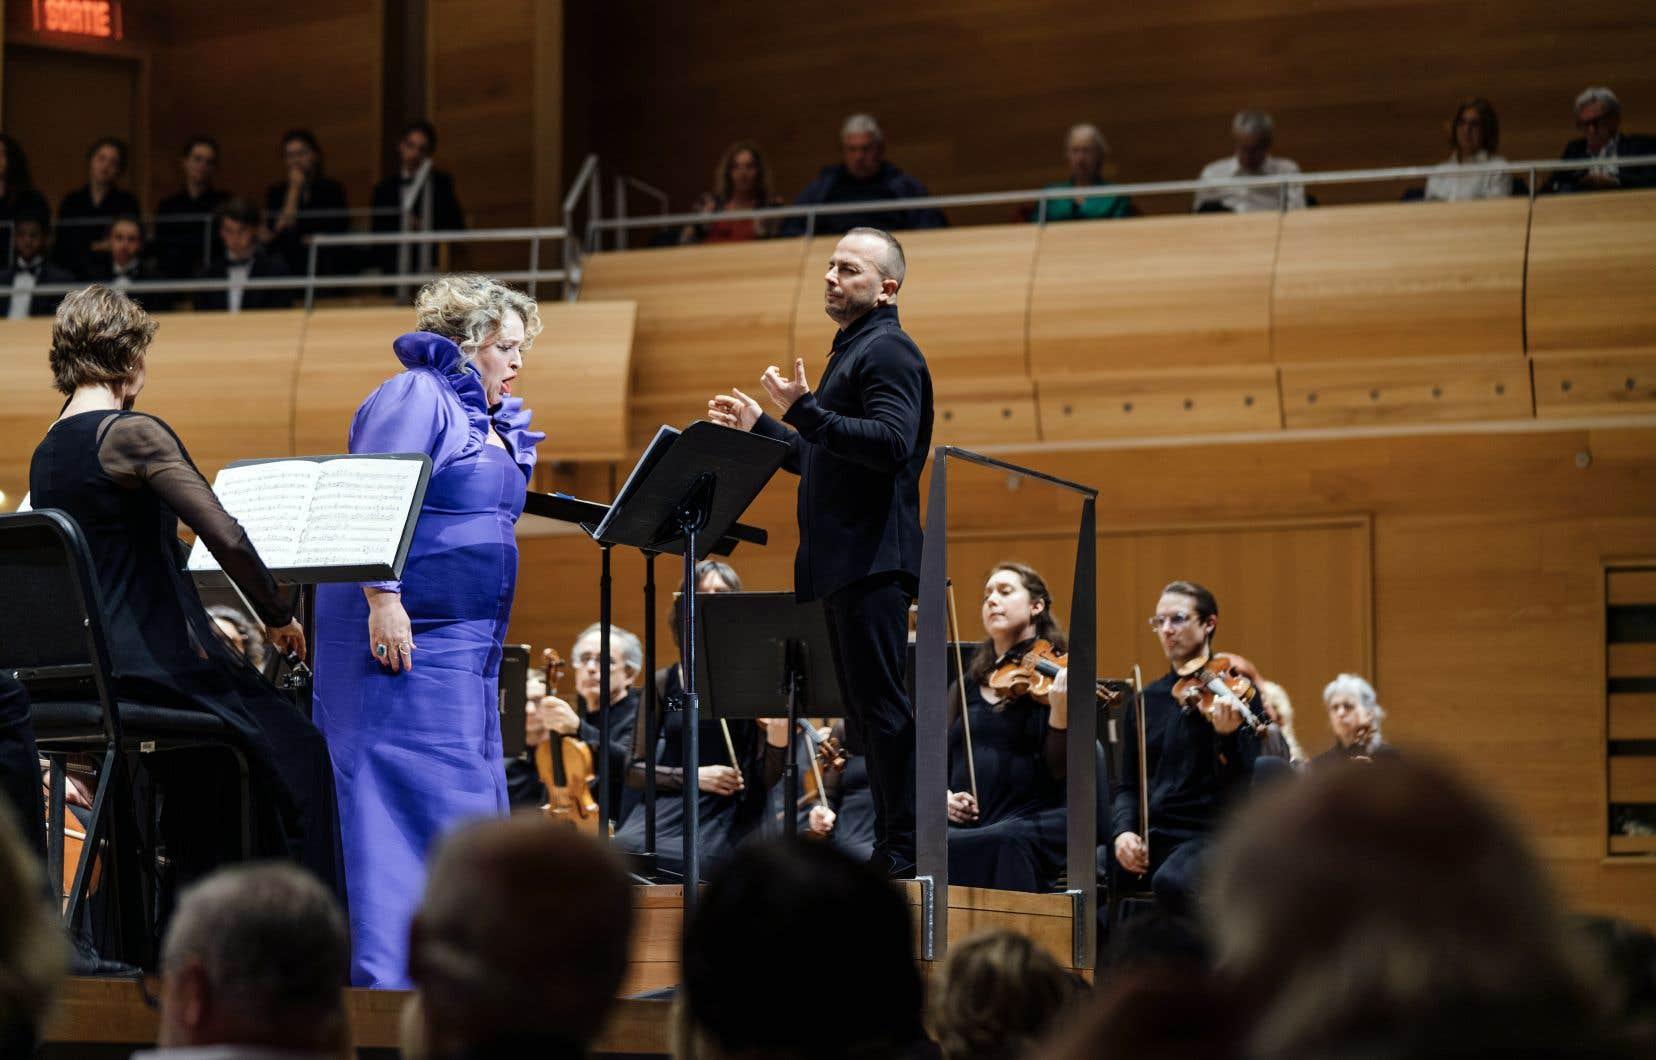 La soprano Karina Gauvin et le chef Yannick Nézet-Séguin